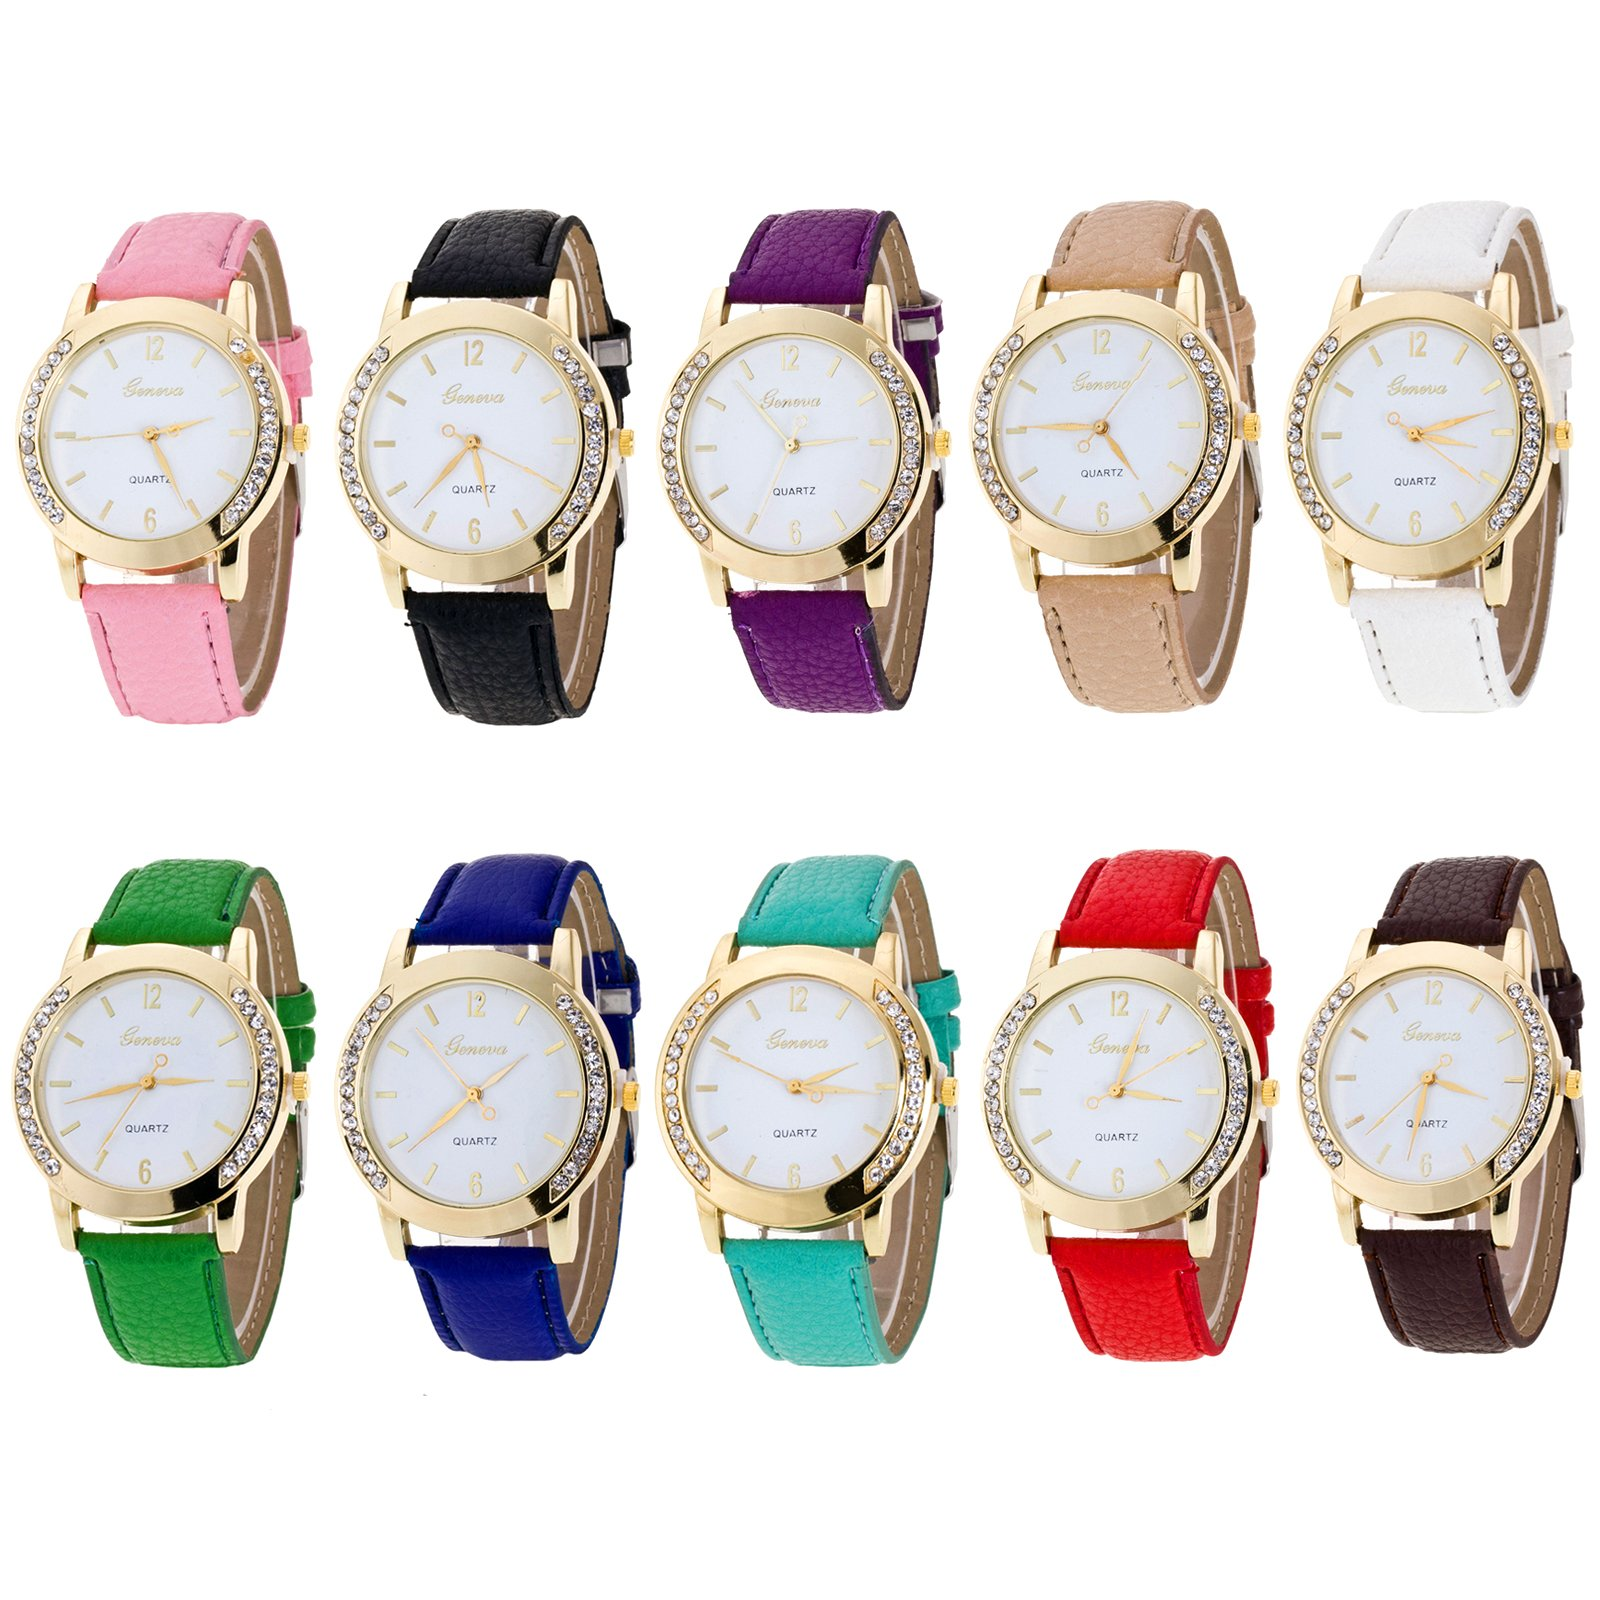 Geneva Women's Wholesale 10 Pcs Wholesale Women Watches Leather Rhinestone Inlaid Quartz Jelly Dress Wristwatch (10PACK)